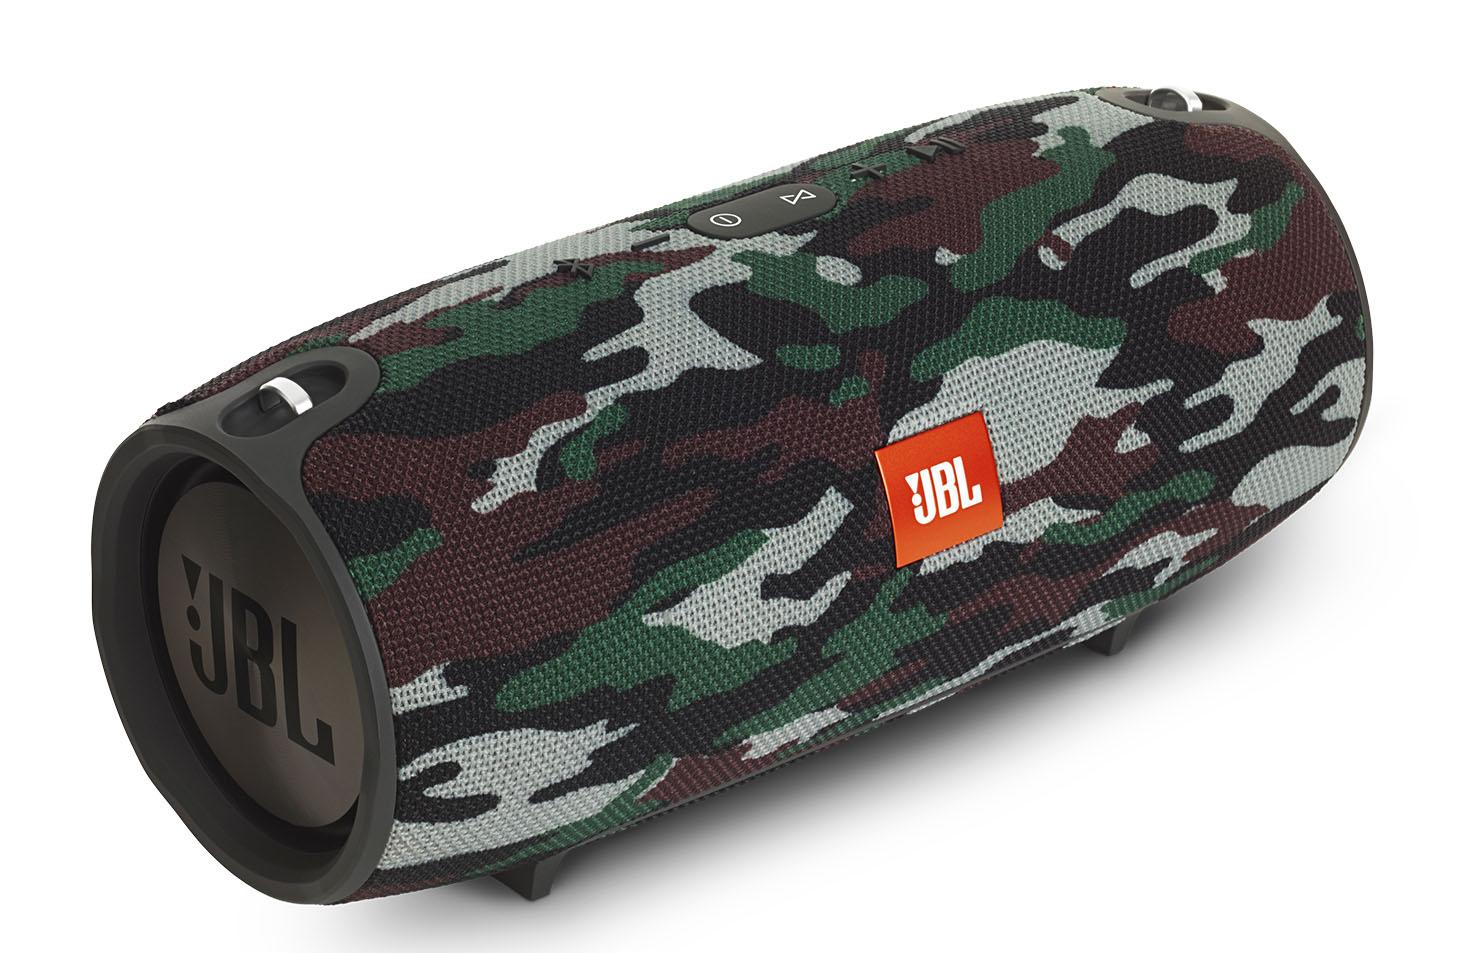 JBL Xtreme Bluetooth Αδιάβροχο Ηχείο Squad (Πληρωμή έως 12 δόσεις)